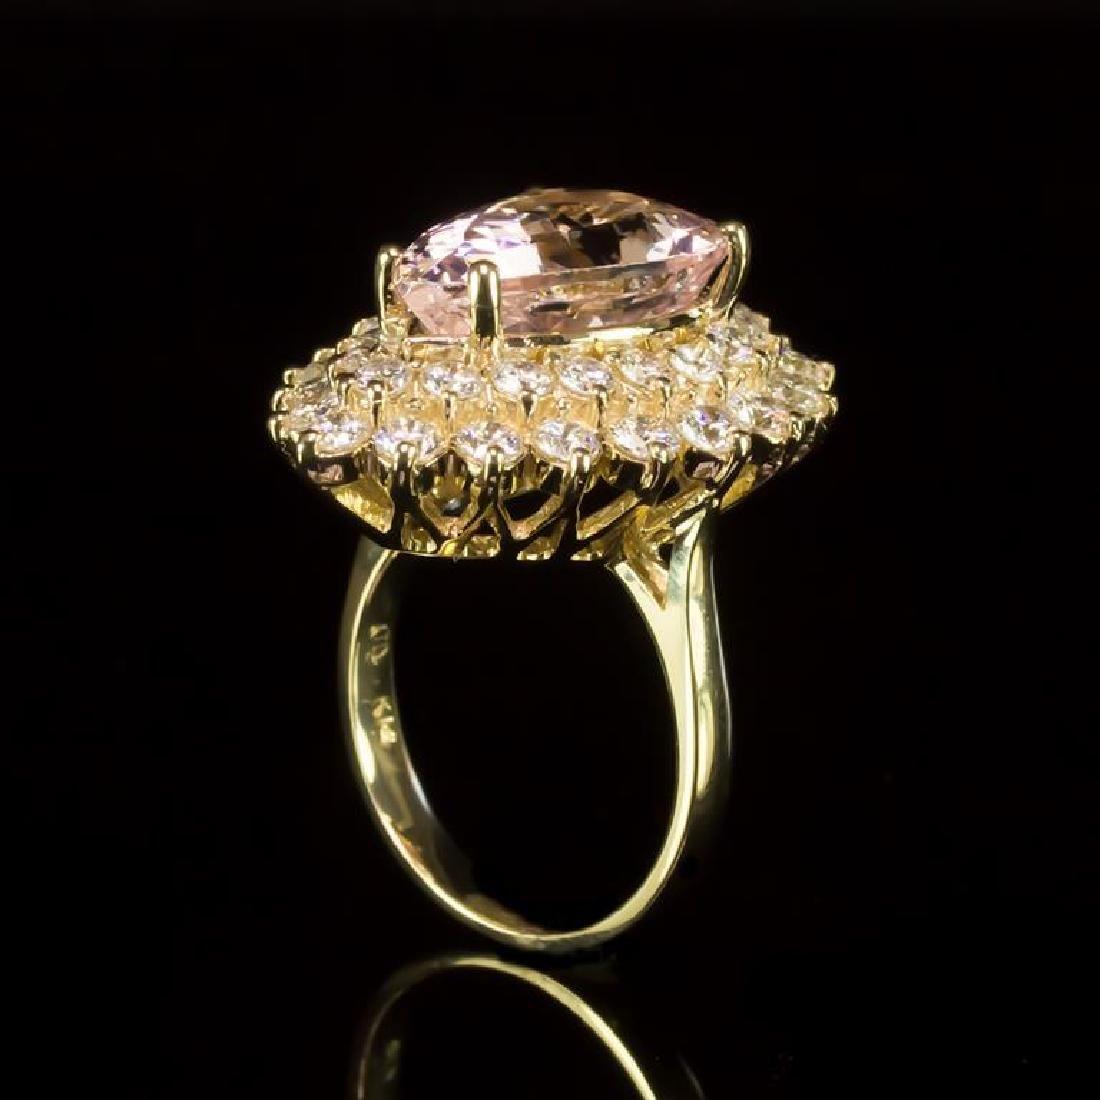 14K Gold 6.88ct Morganite 2.67ct Diamond Ring - 3